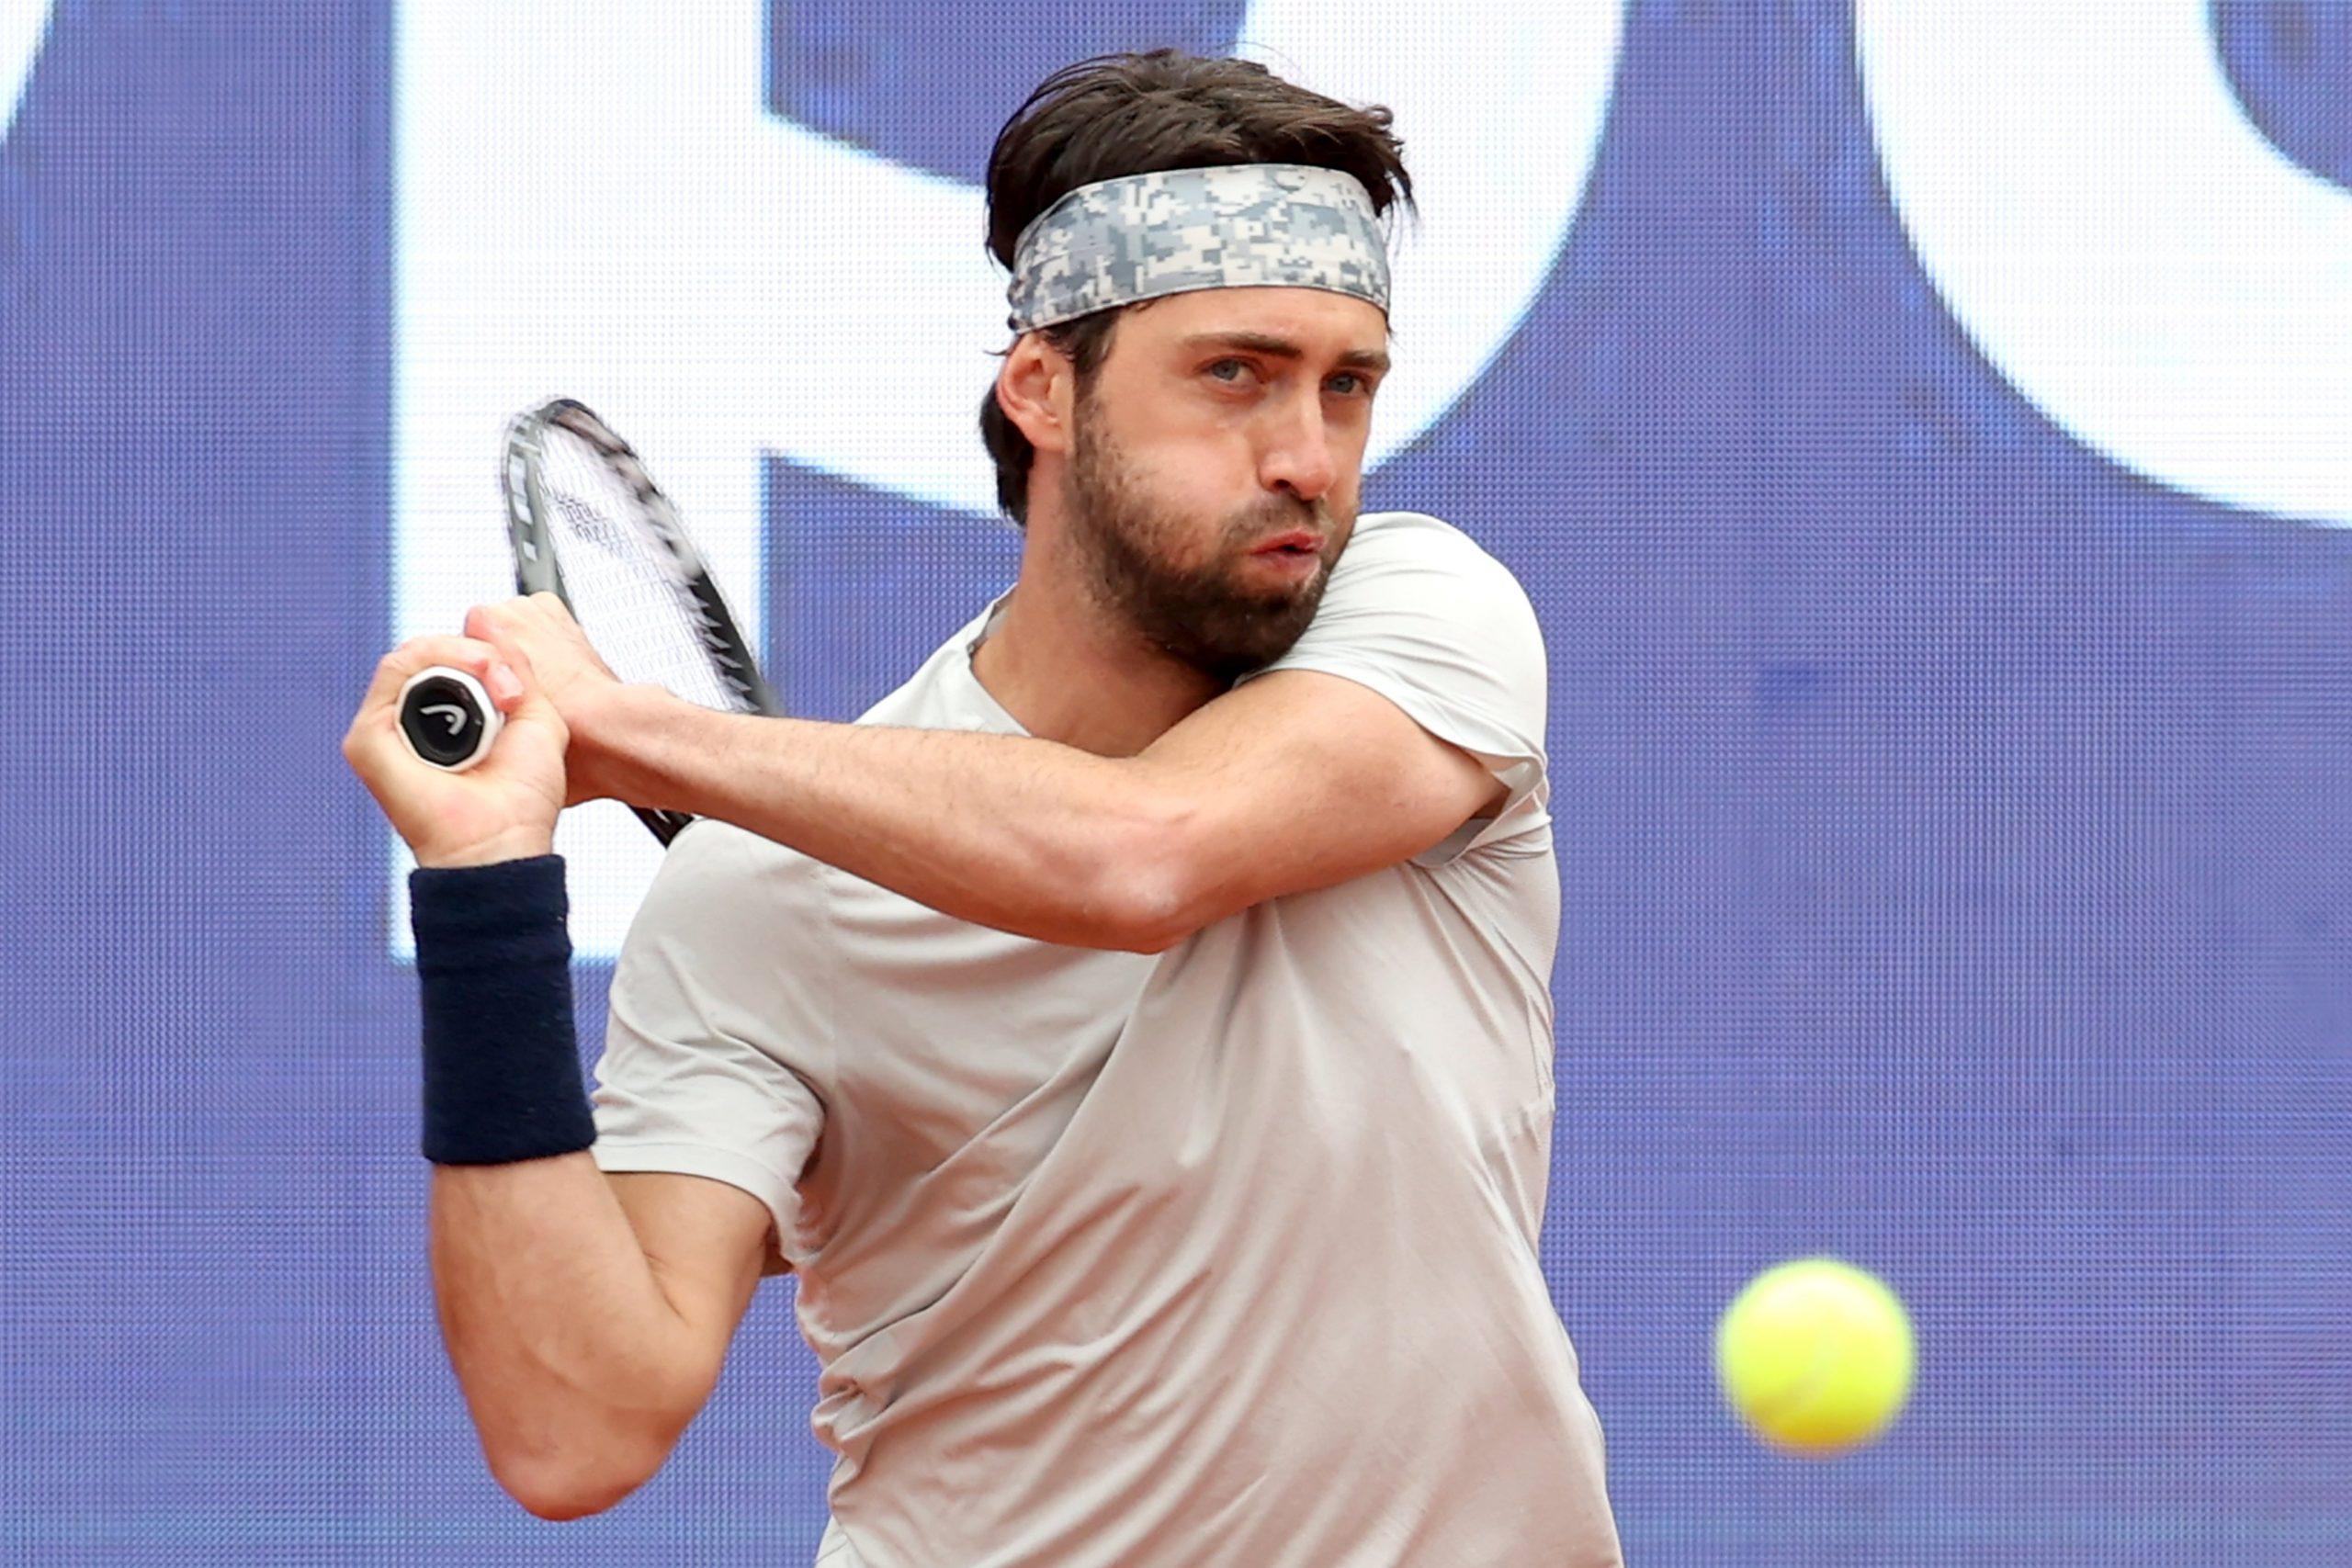 E0YveVIWQAAuYXD scaled #новости грузинский теннисист, Николоз Басилашвили, теннис